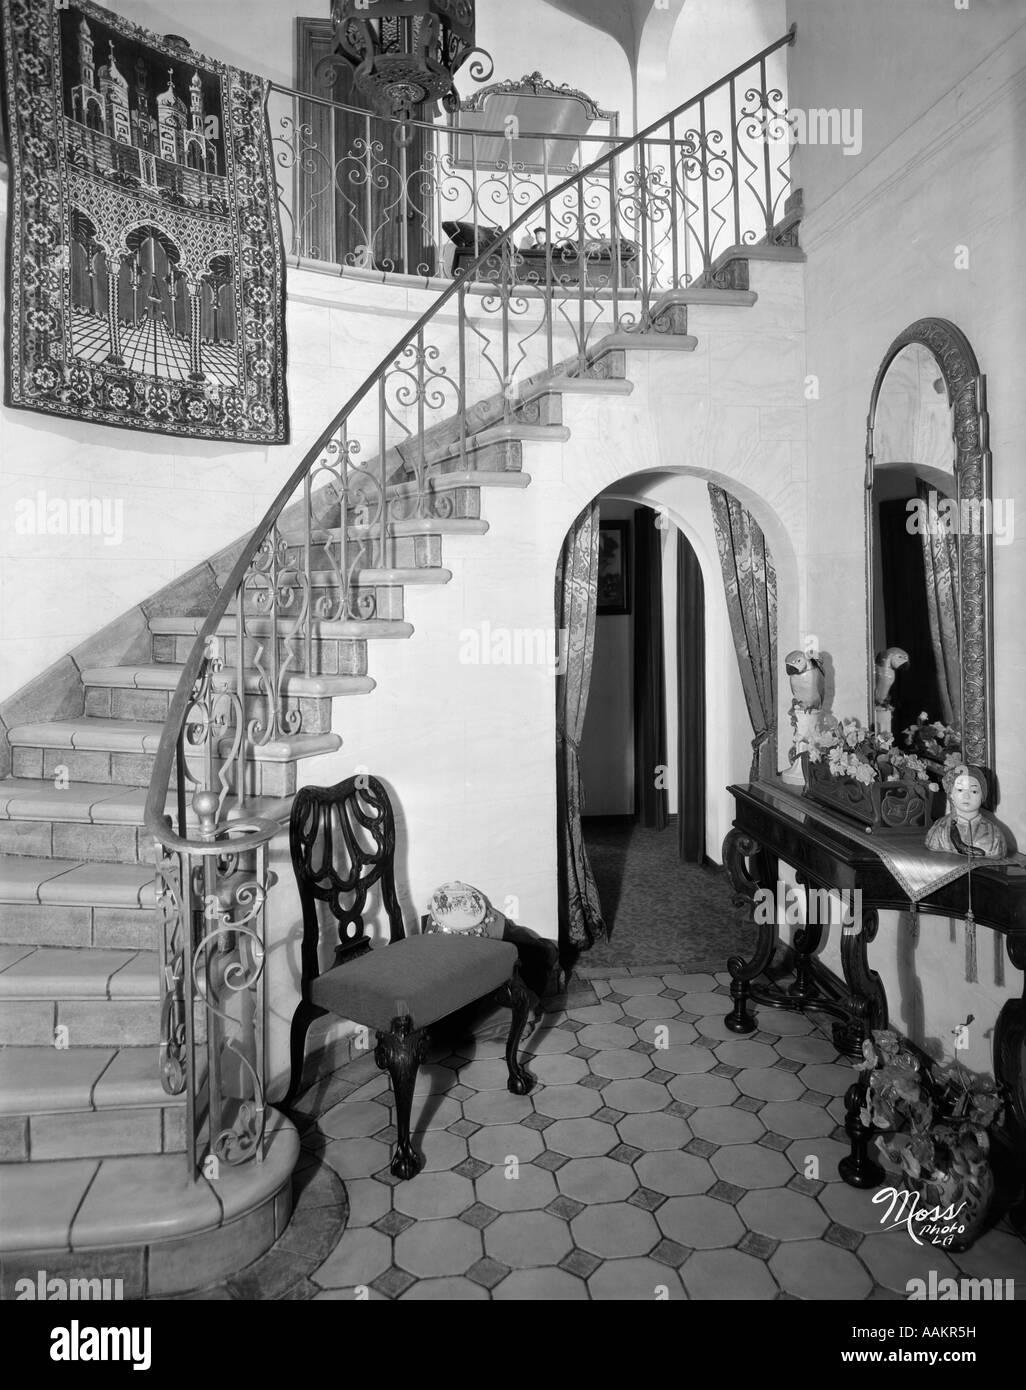 1920s Interior Staircase Wrought Iron Railing Stock Photo